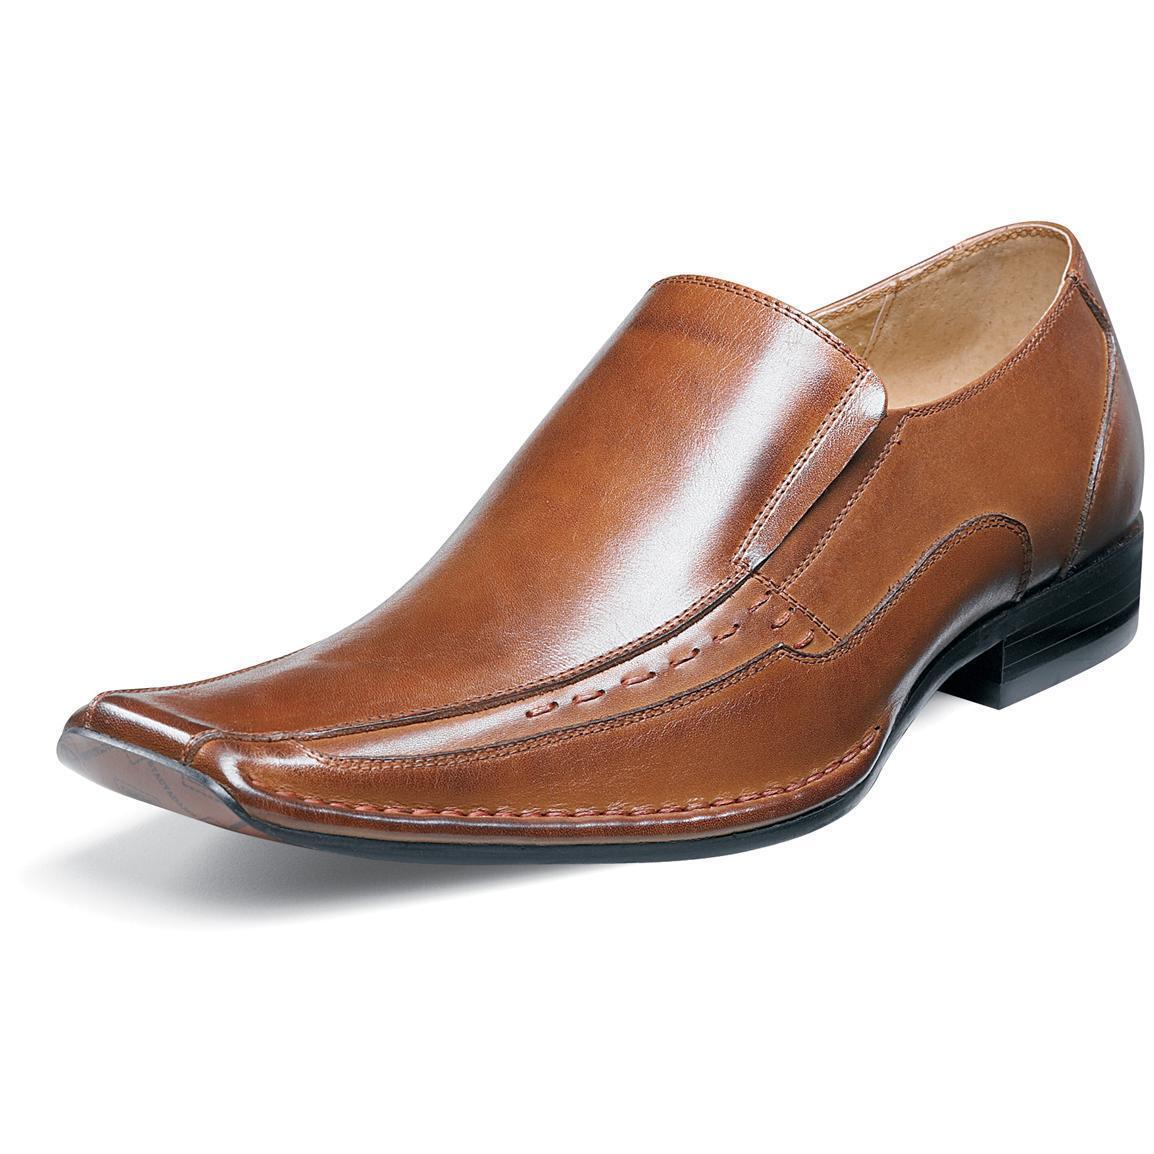 Stacy Adams TEMPLIN 24507 Uomo Cognac 221 Pelle Slip On Dress Oxford Shoes